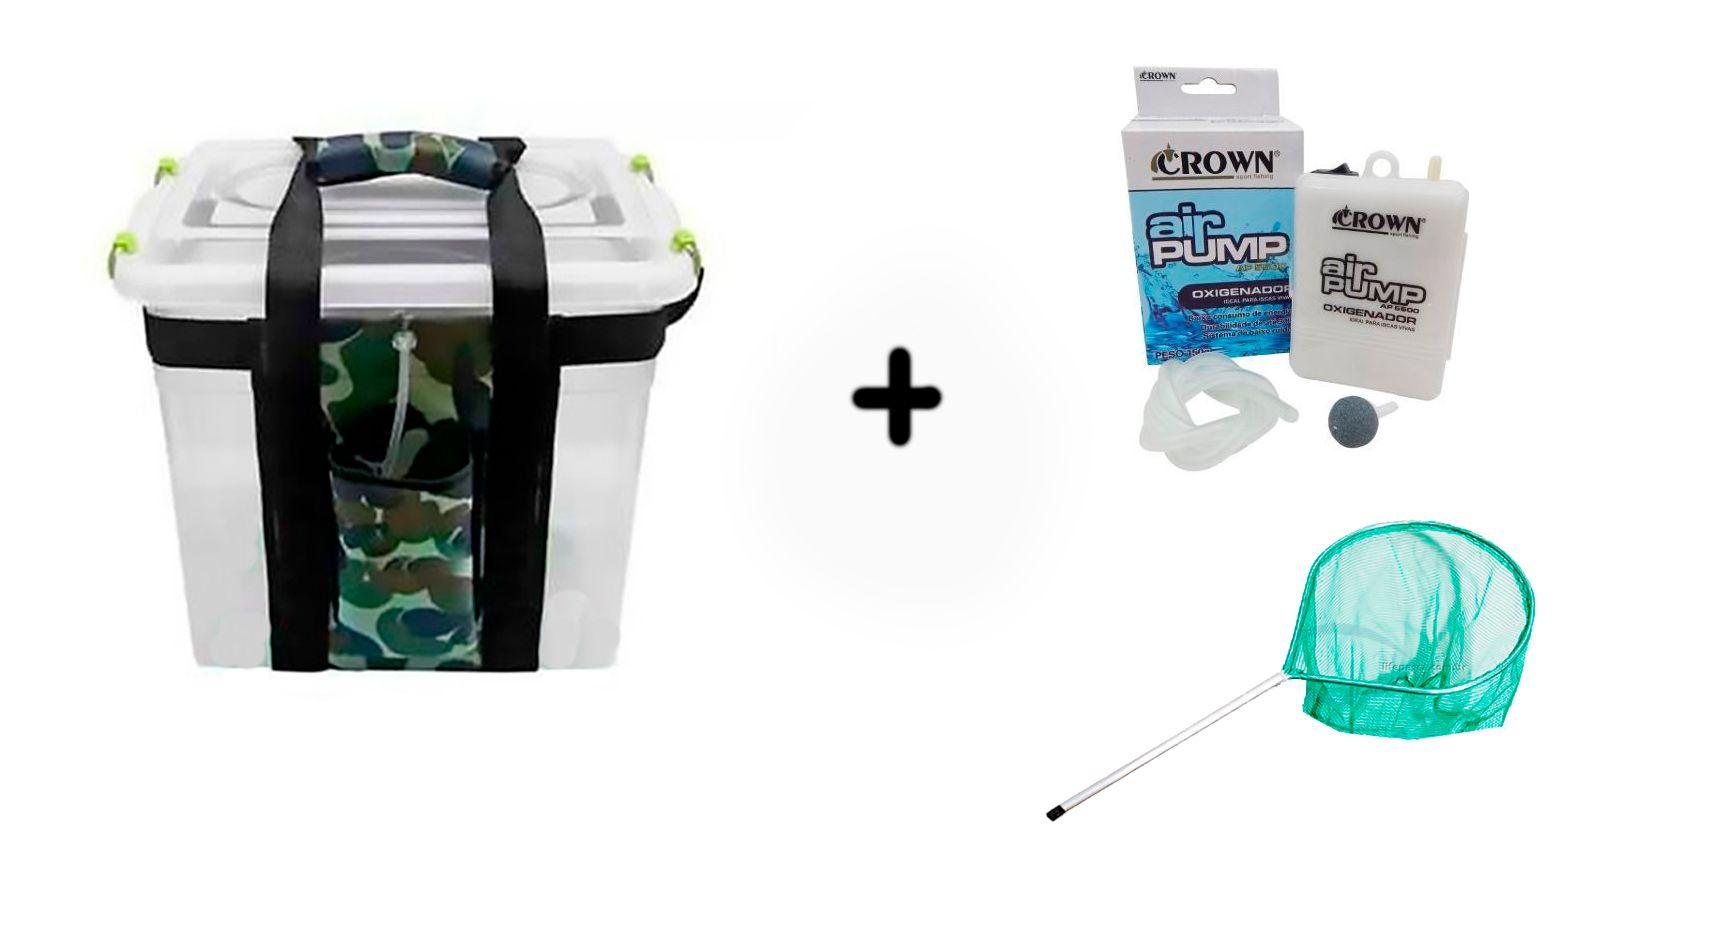 Kit Transisca Action 20 Lts + Oxigenador Crown + Passaguá Mini